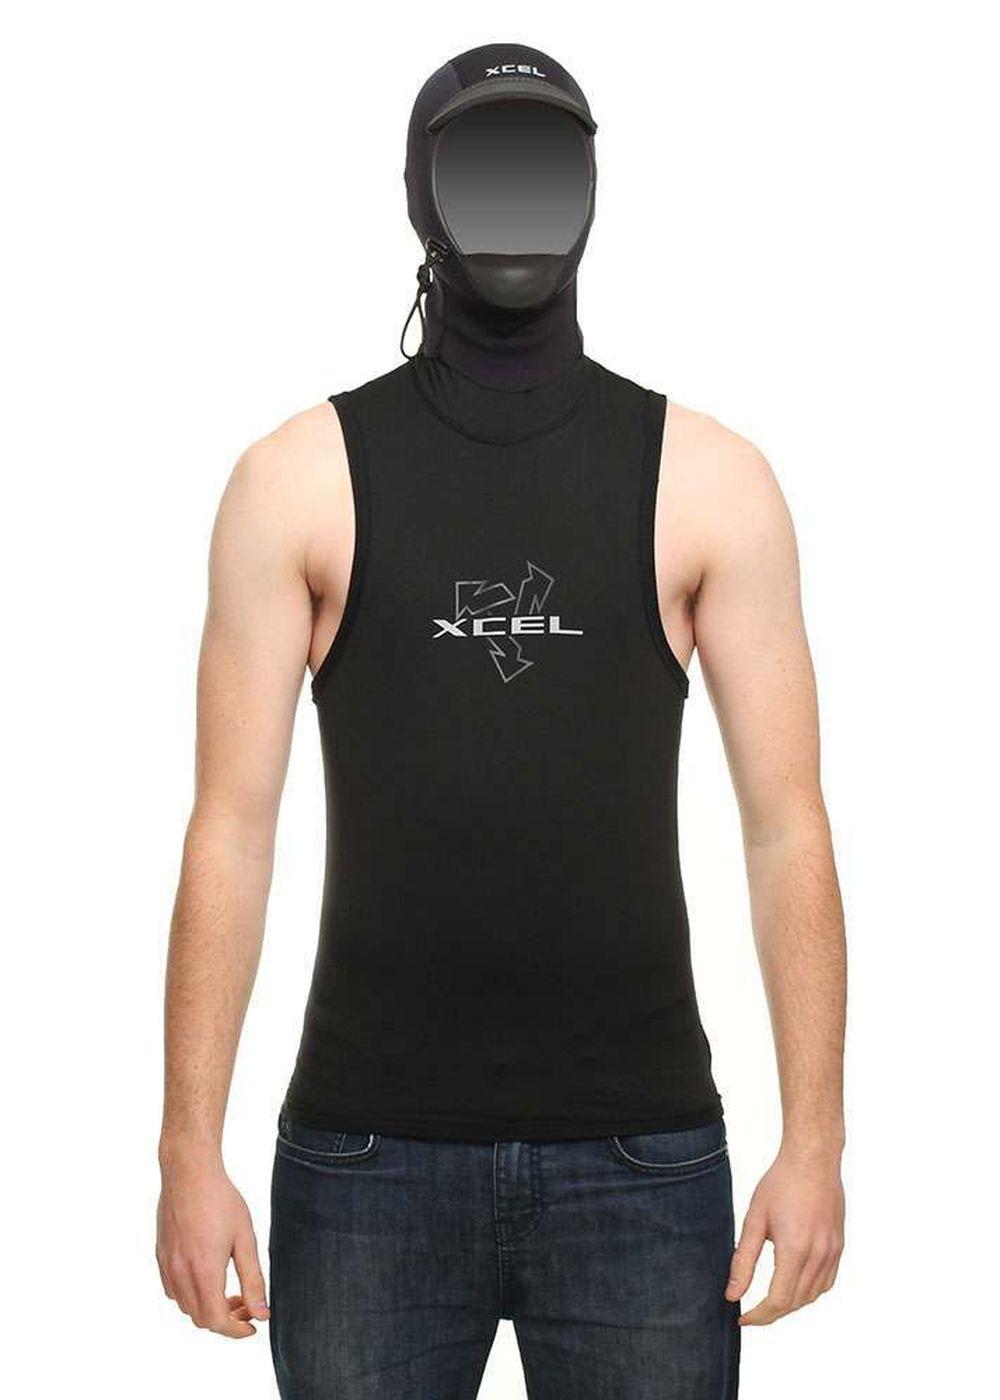 Xcel Hooded Polypro Thermal Vest Rashvest Picture